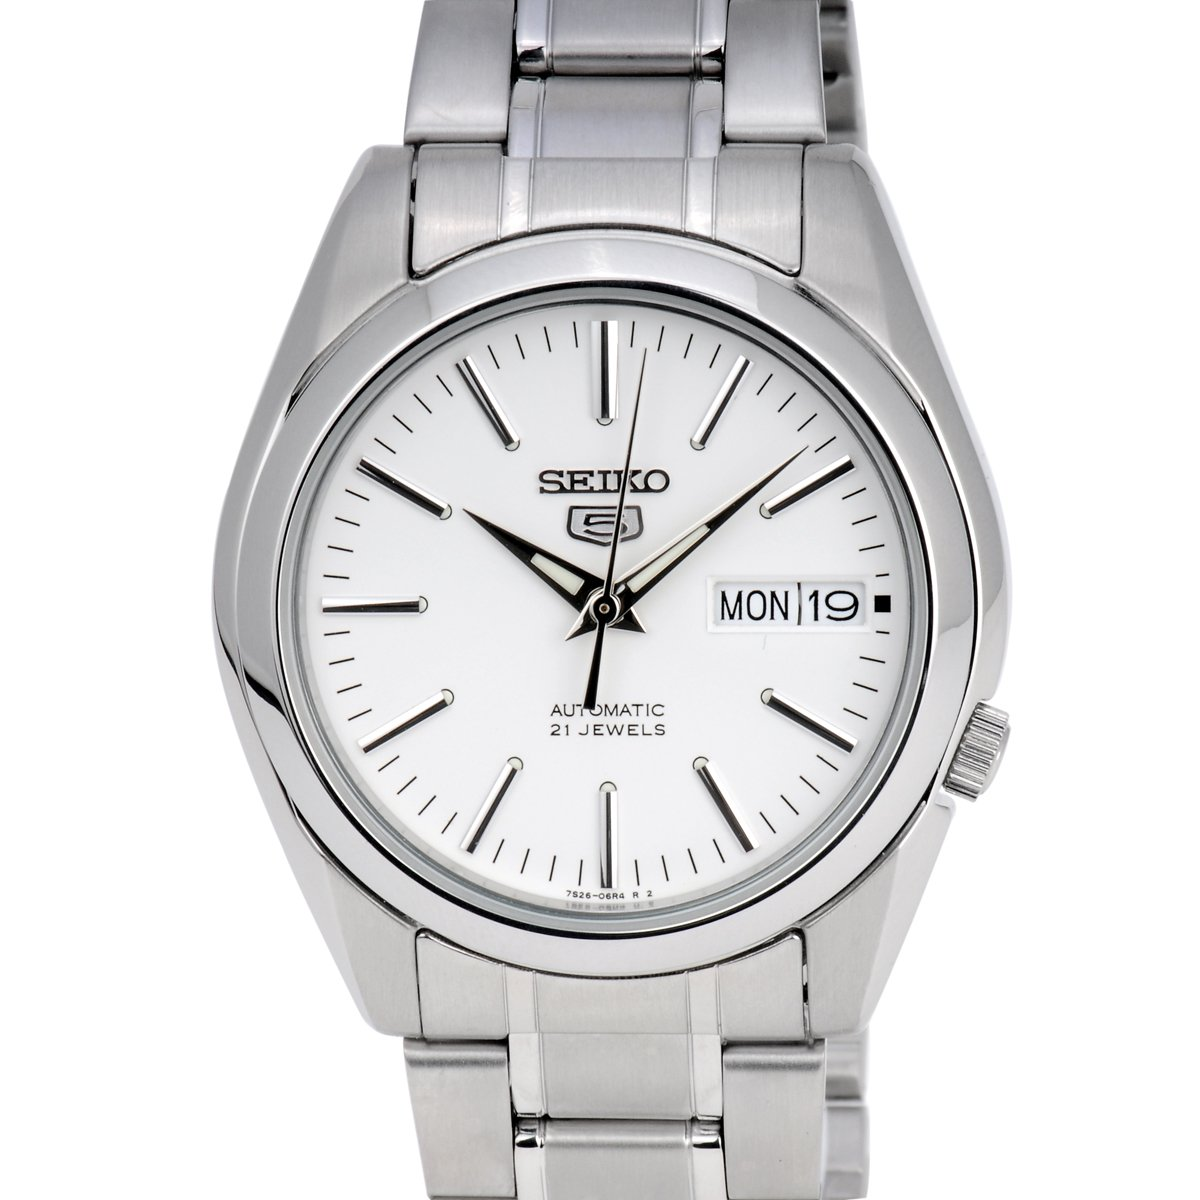 low priced 83e69 61f3b Seiko 5 Sports Automat Watch SNKL41K1: Amazon.co.uk: Watches